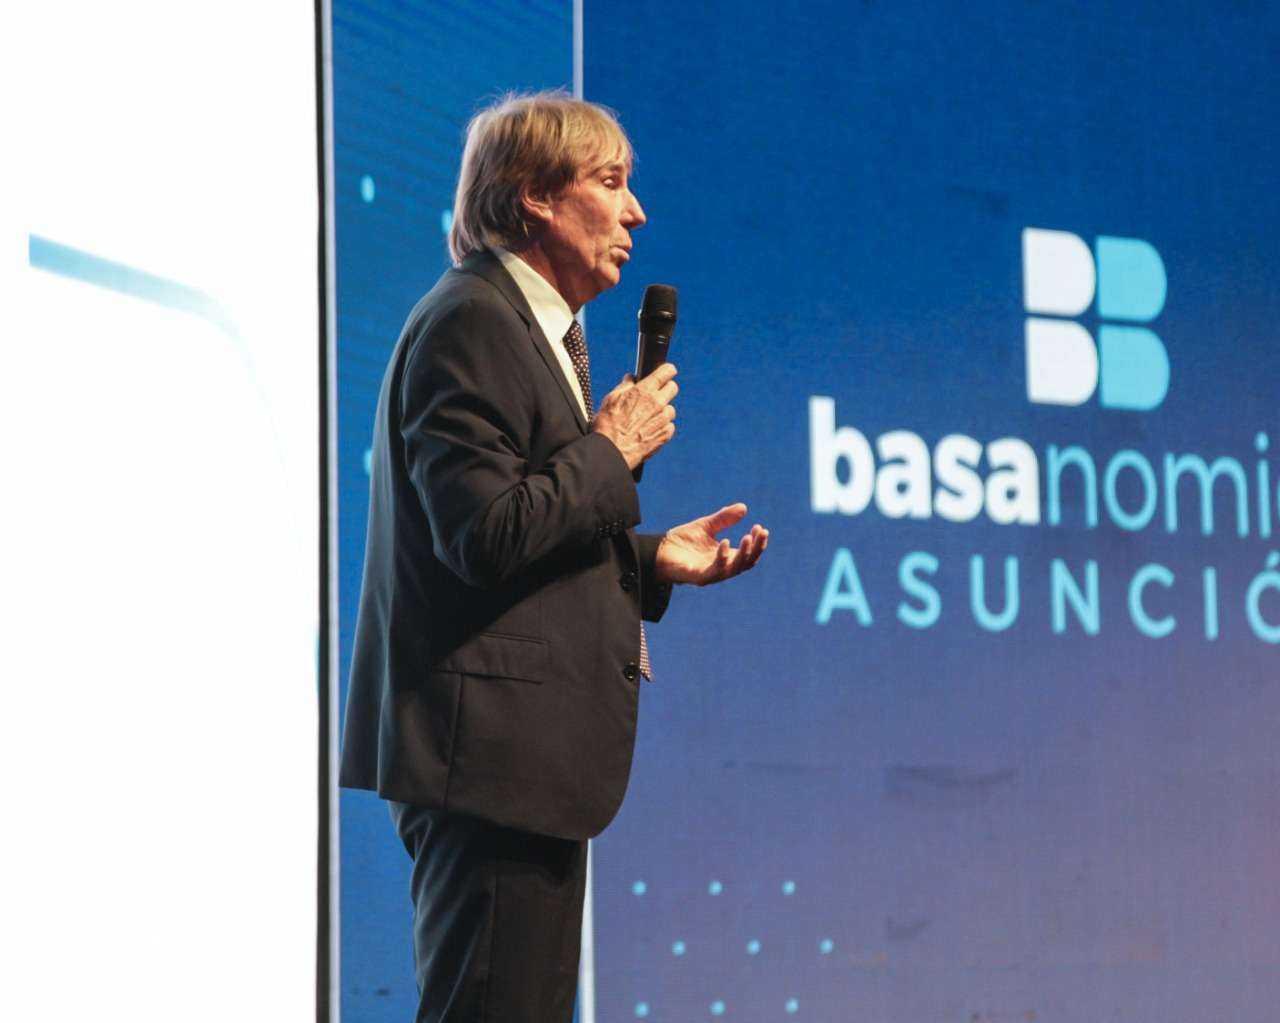 Basanomics-Asuncion-2019-Hernan-Buchi